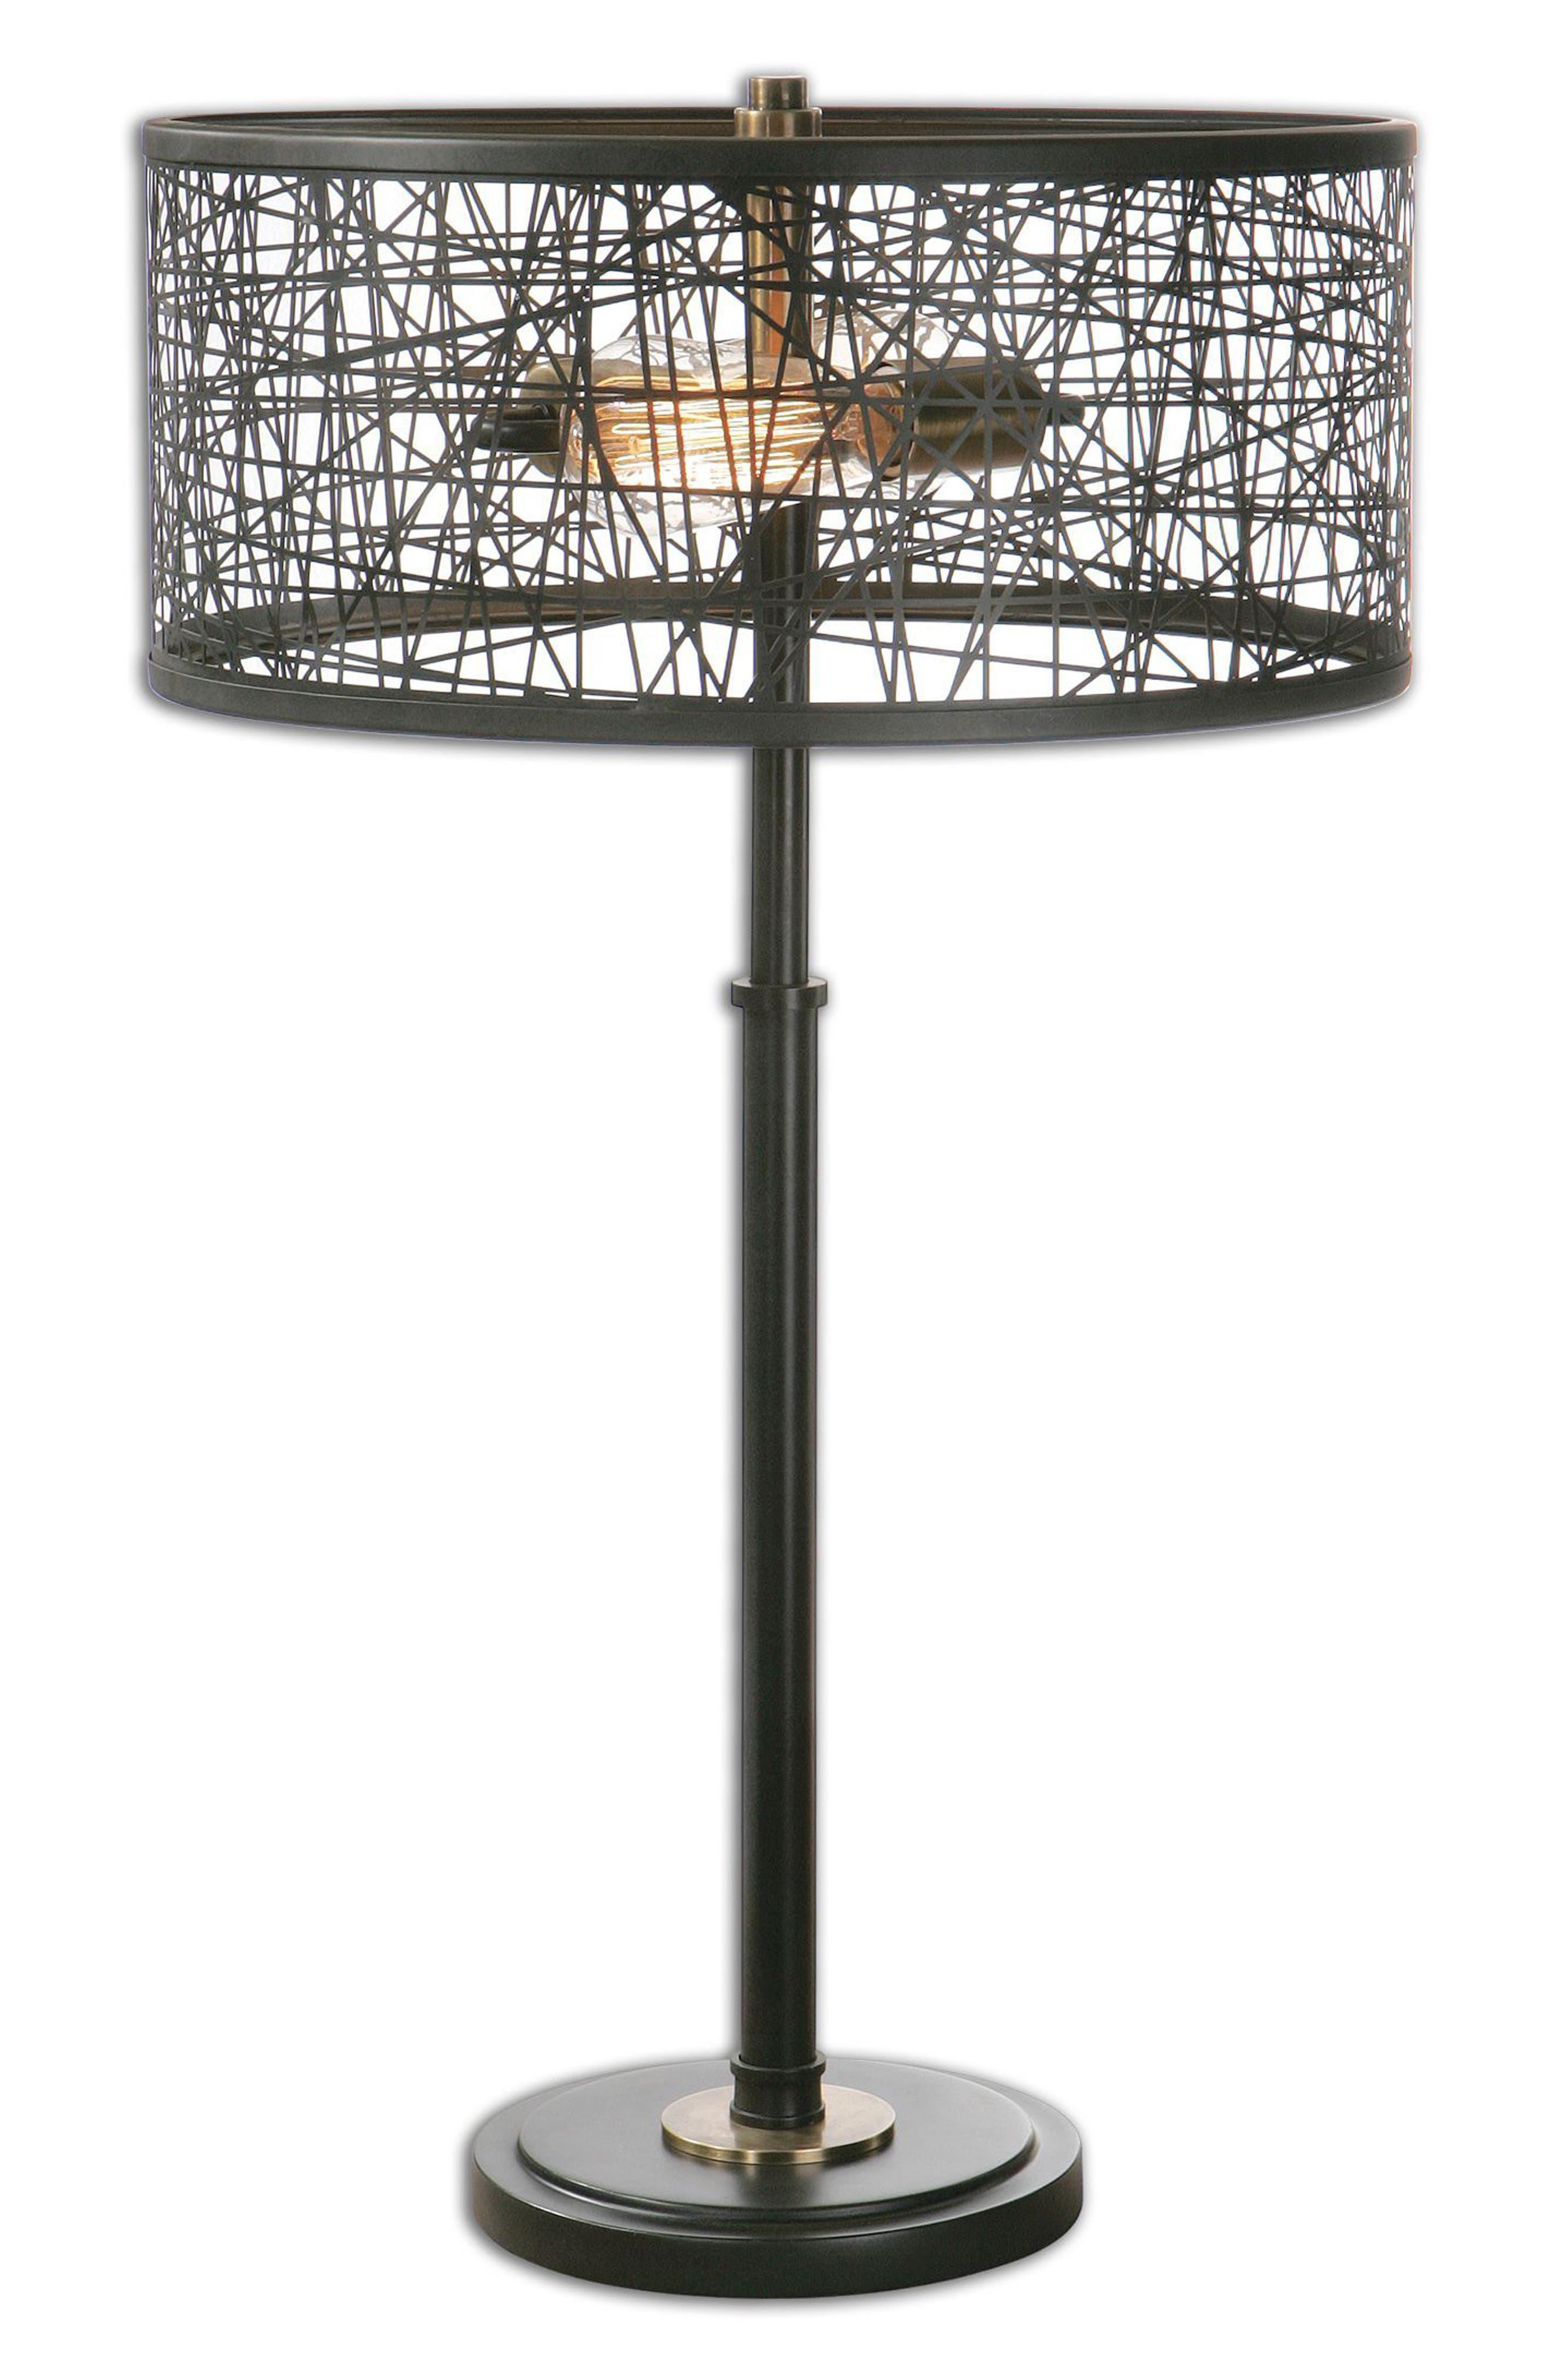 Main Image - Uttermost Alita Table Lamp